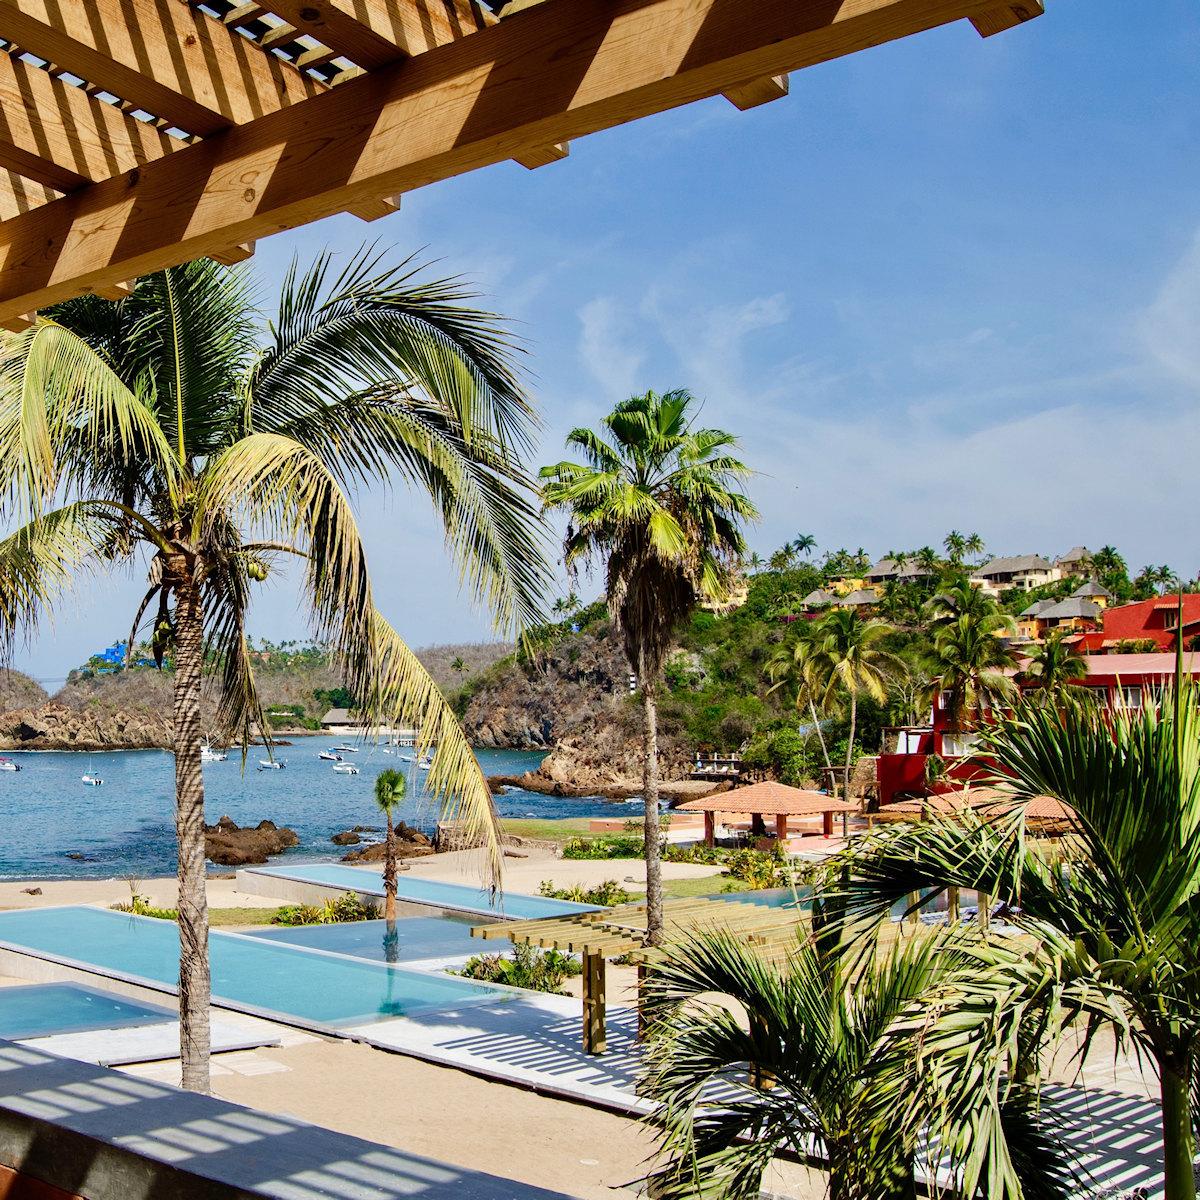 Balcony view El Careyes pools beach casitas mi ojo.jpg